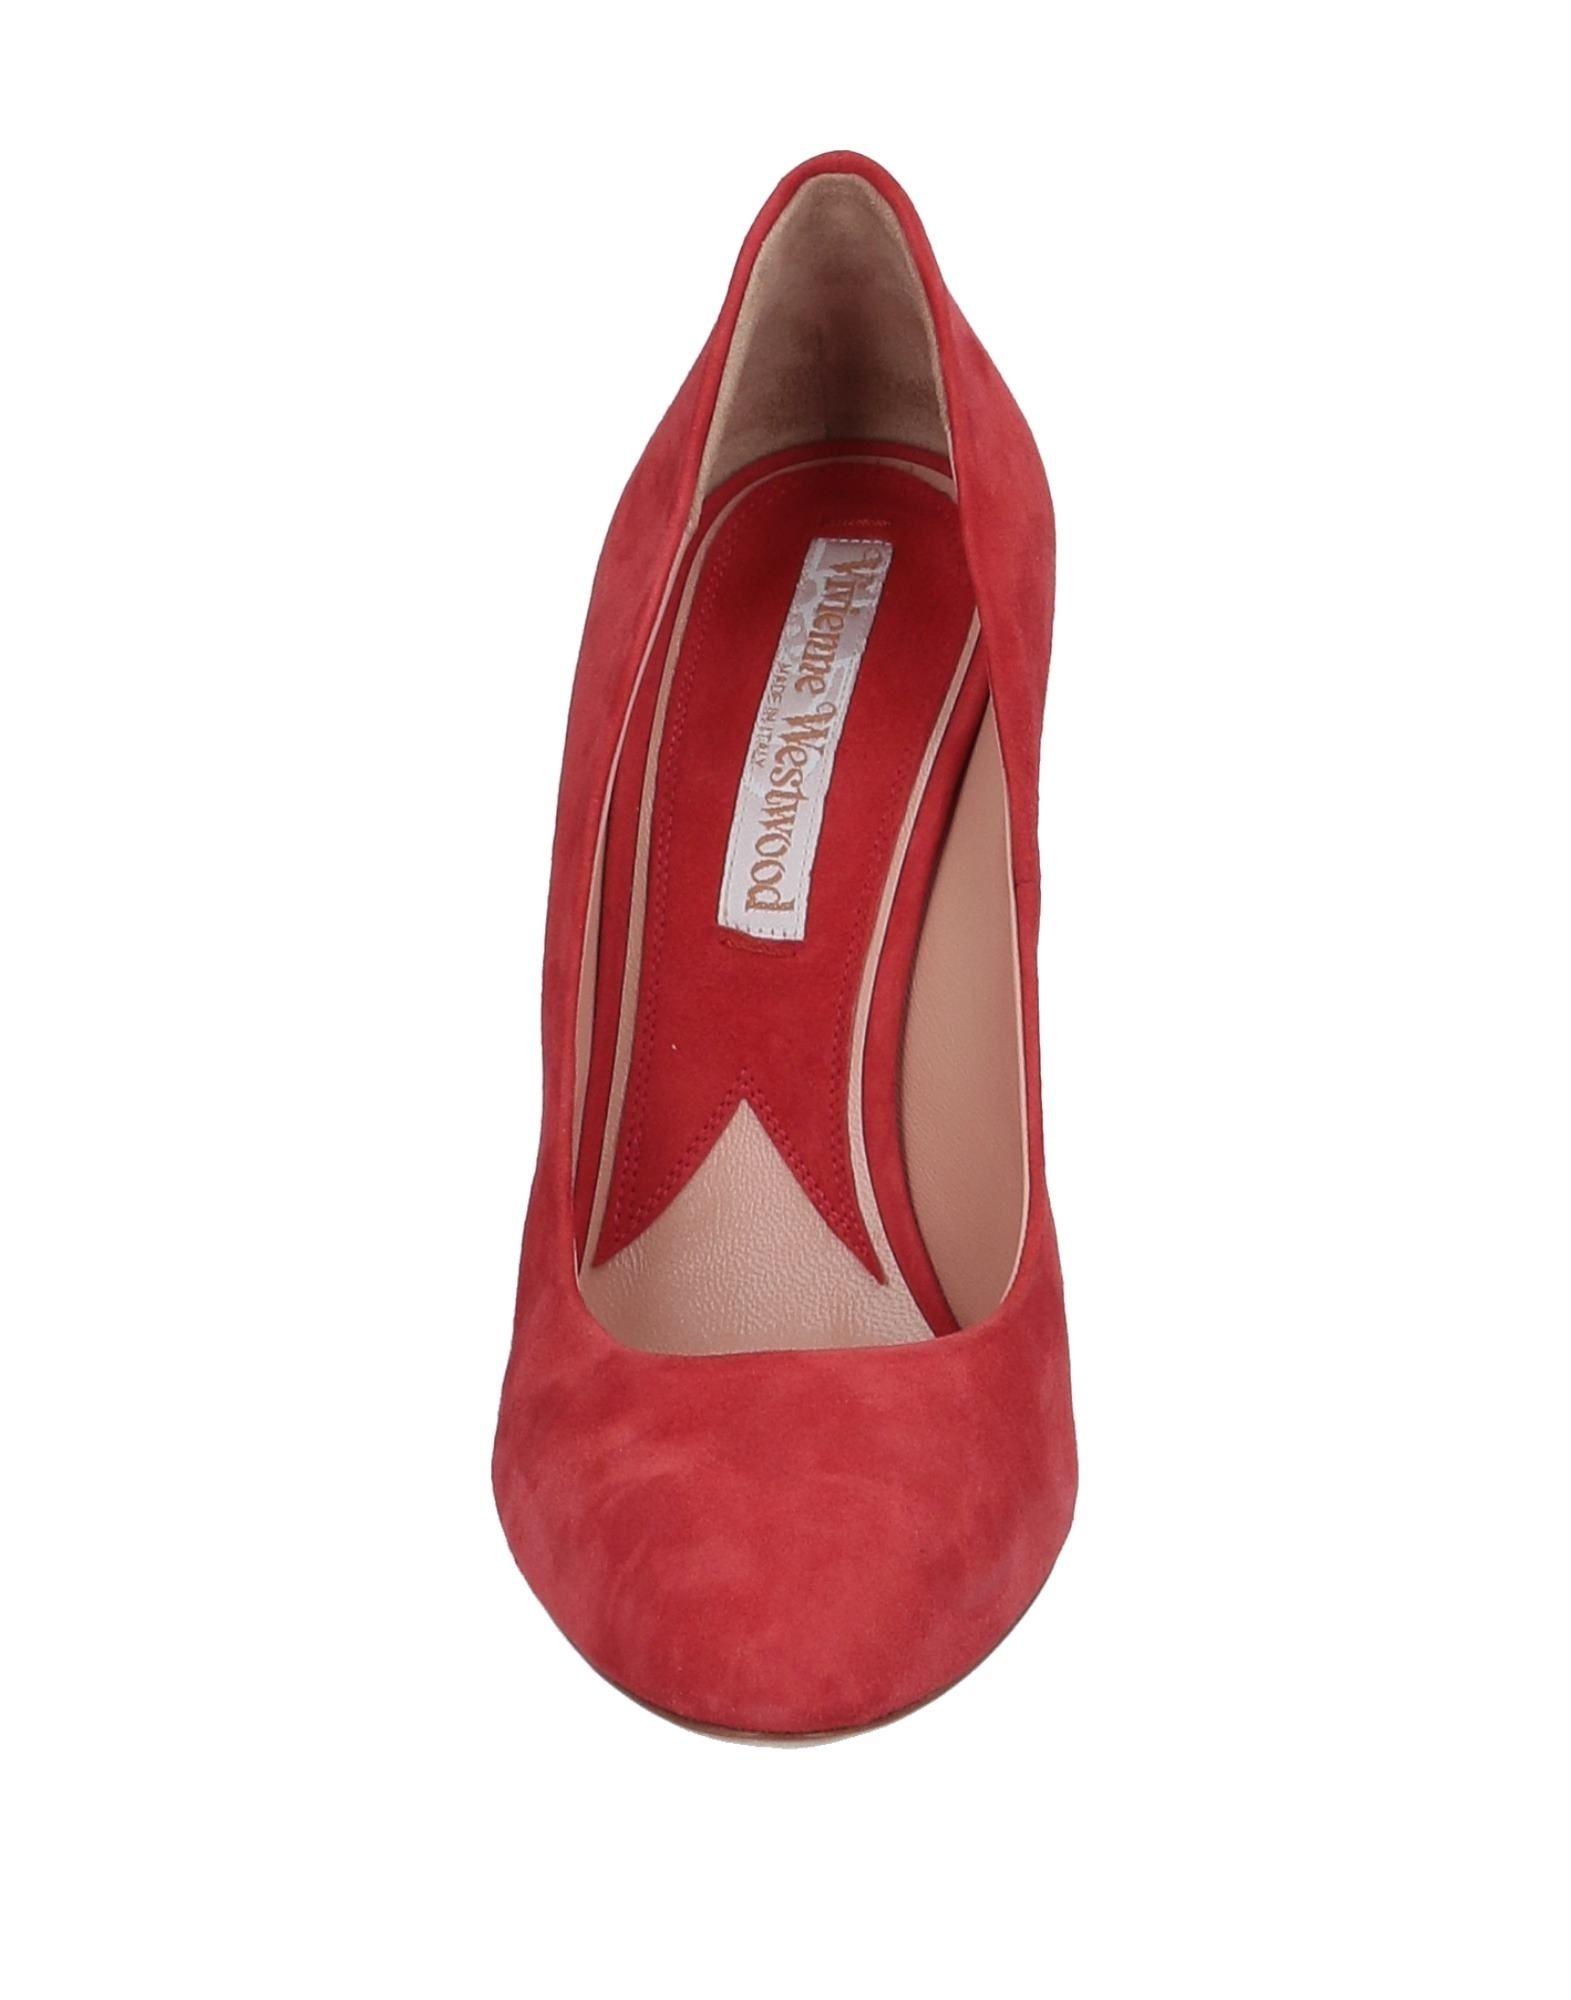 Vivienne Westwood Pumps strapazierfähige Damen  11521073JKGut aussehende strapazierfähige Pumps Schuhe 8dfde0